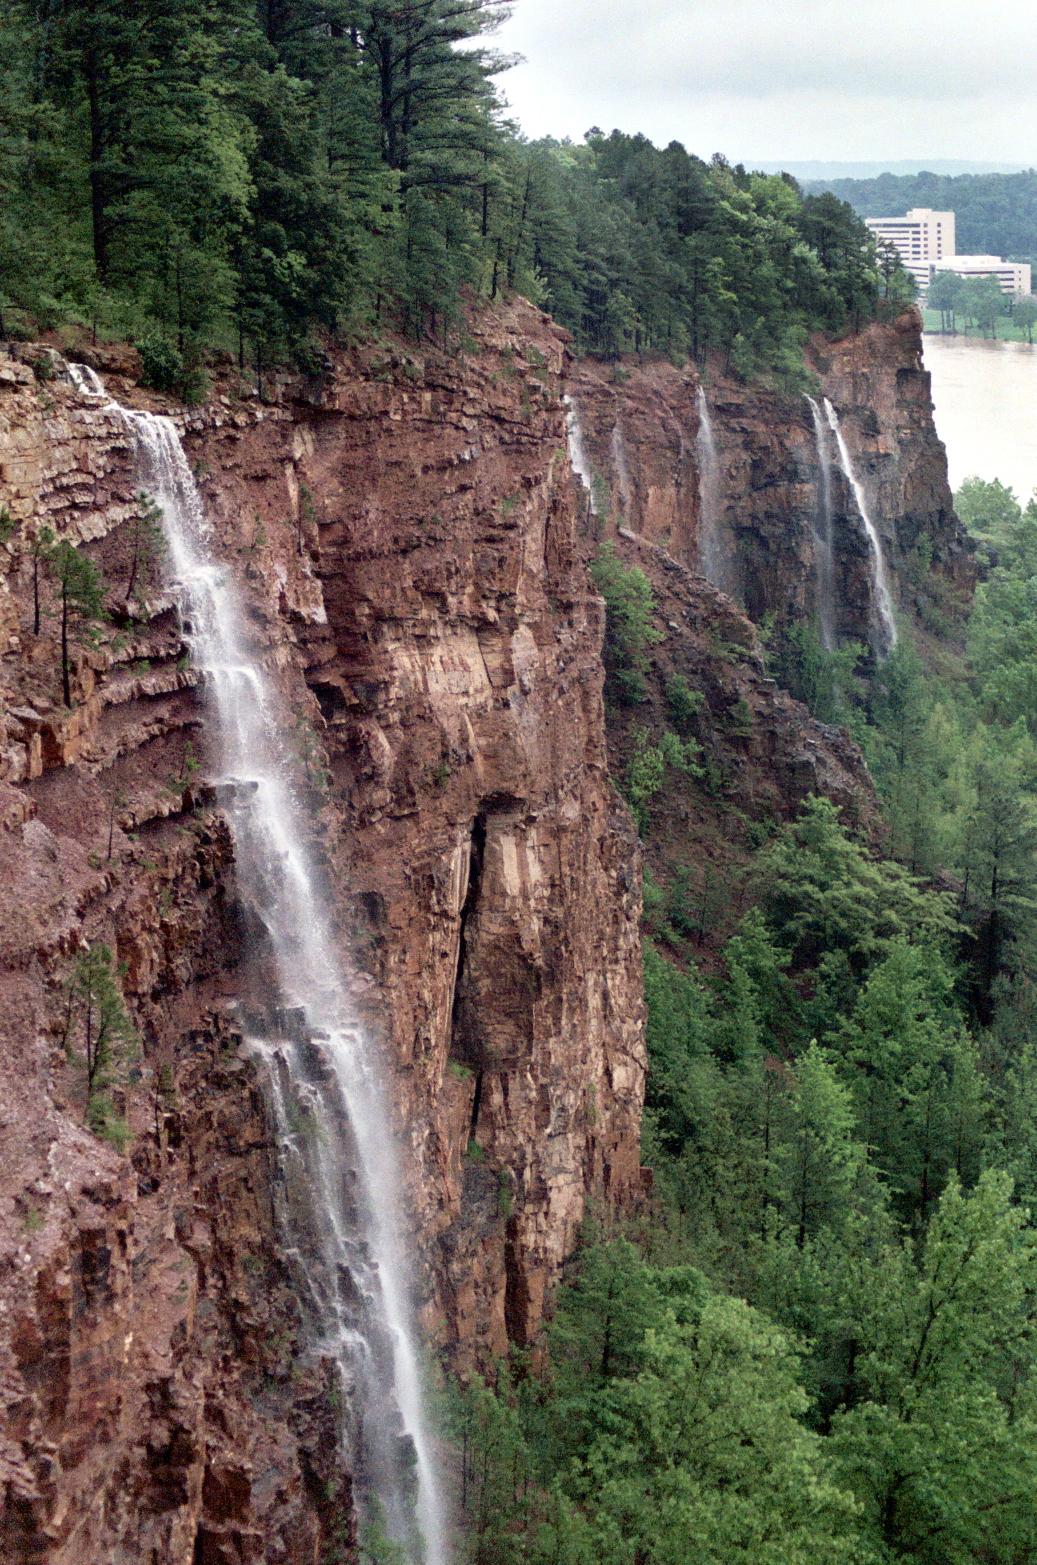 Emerald Park Waterfalls North Little Rock Arkansas